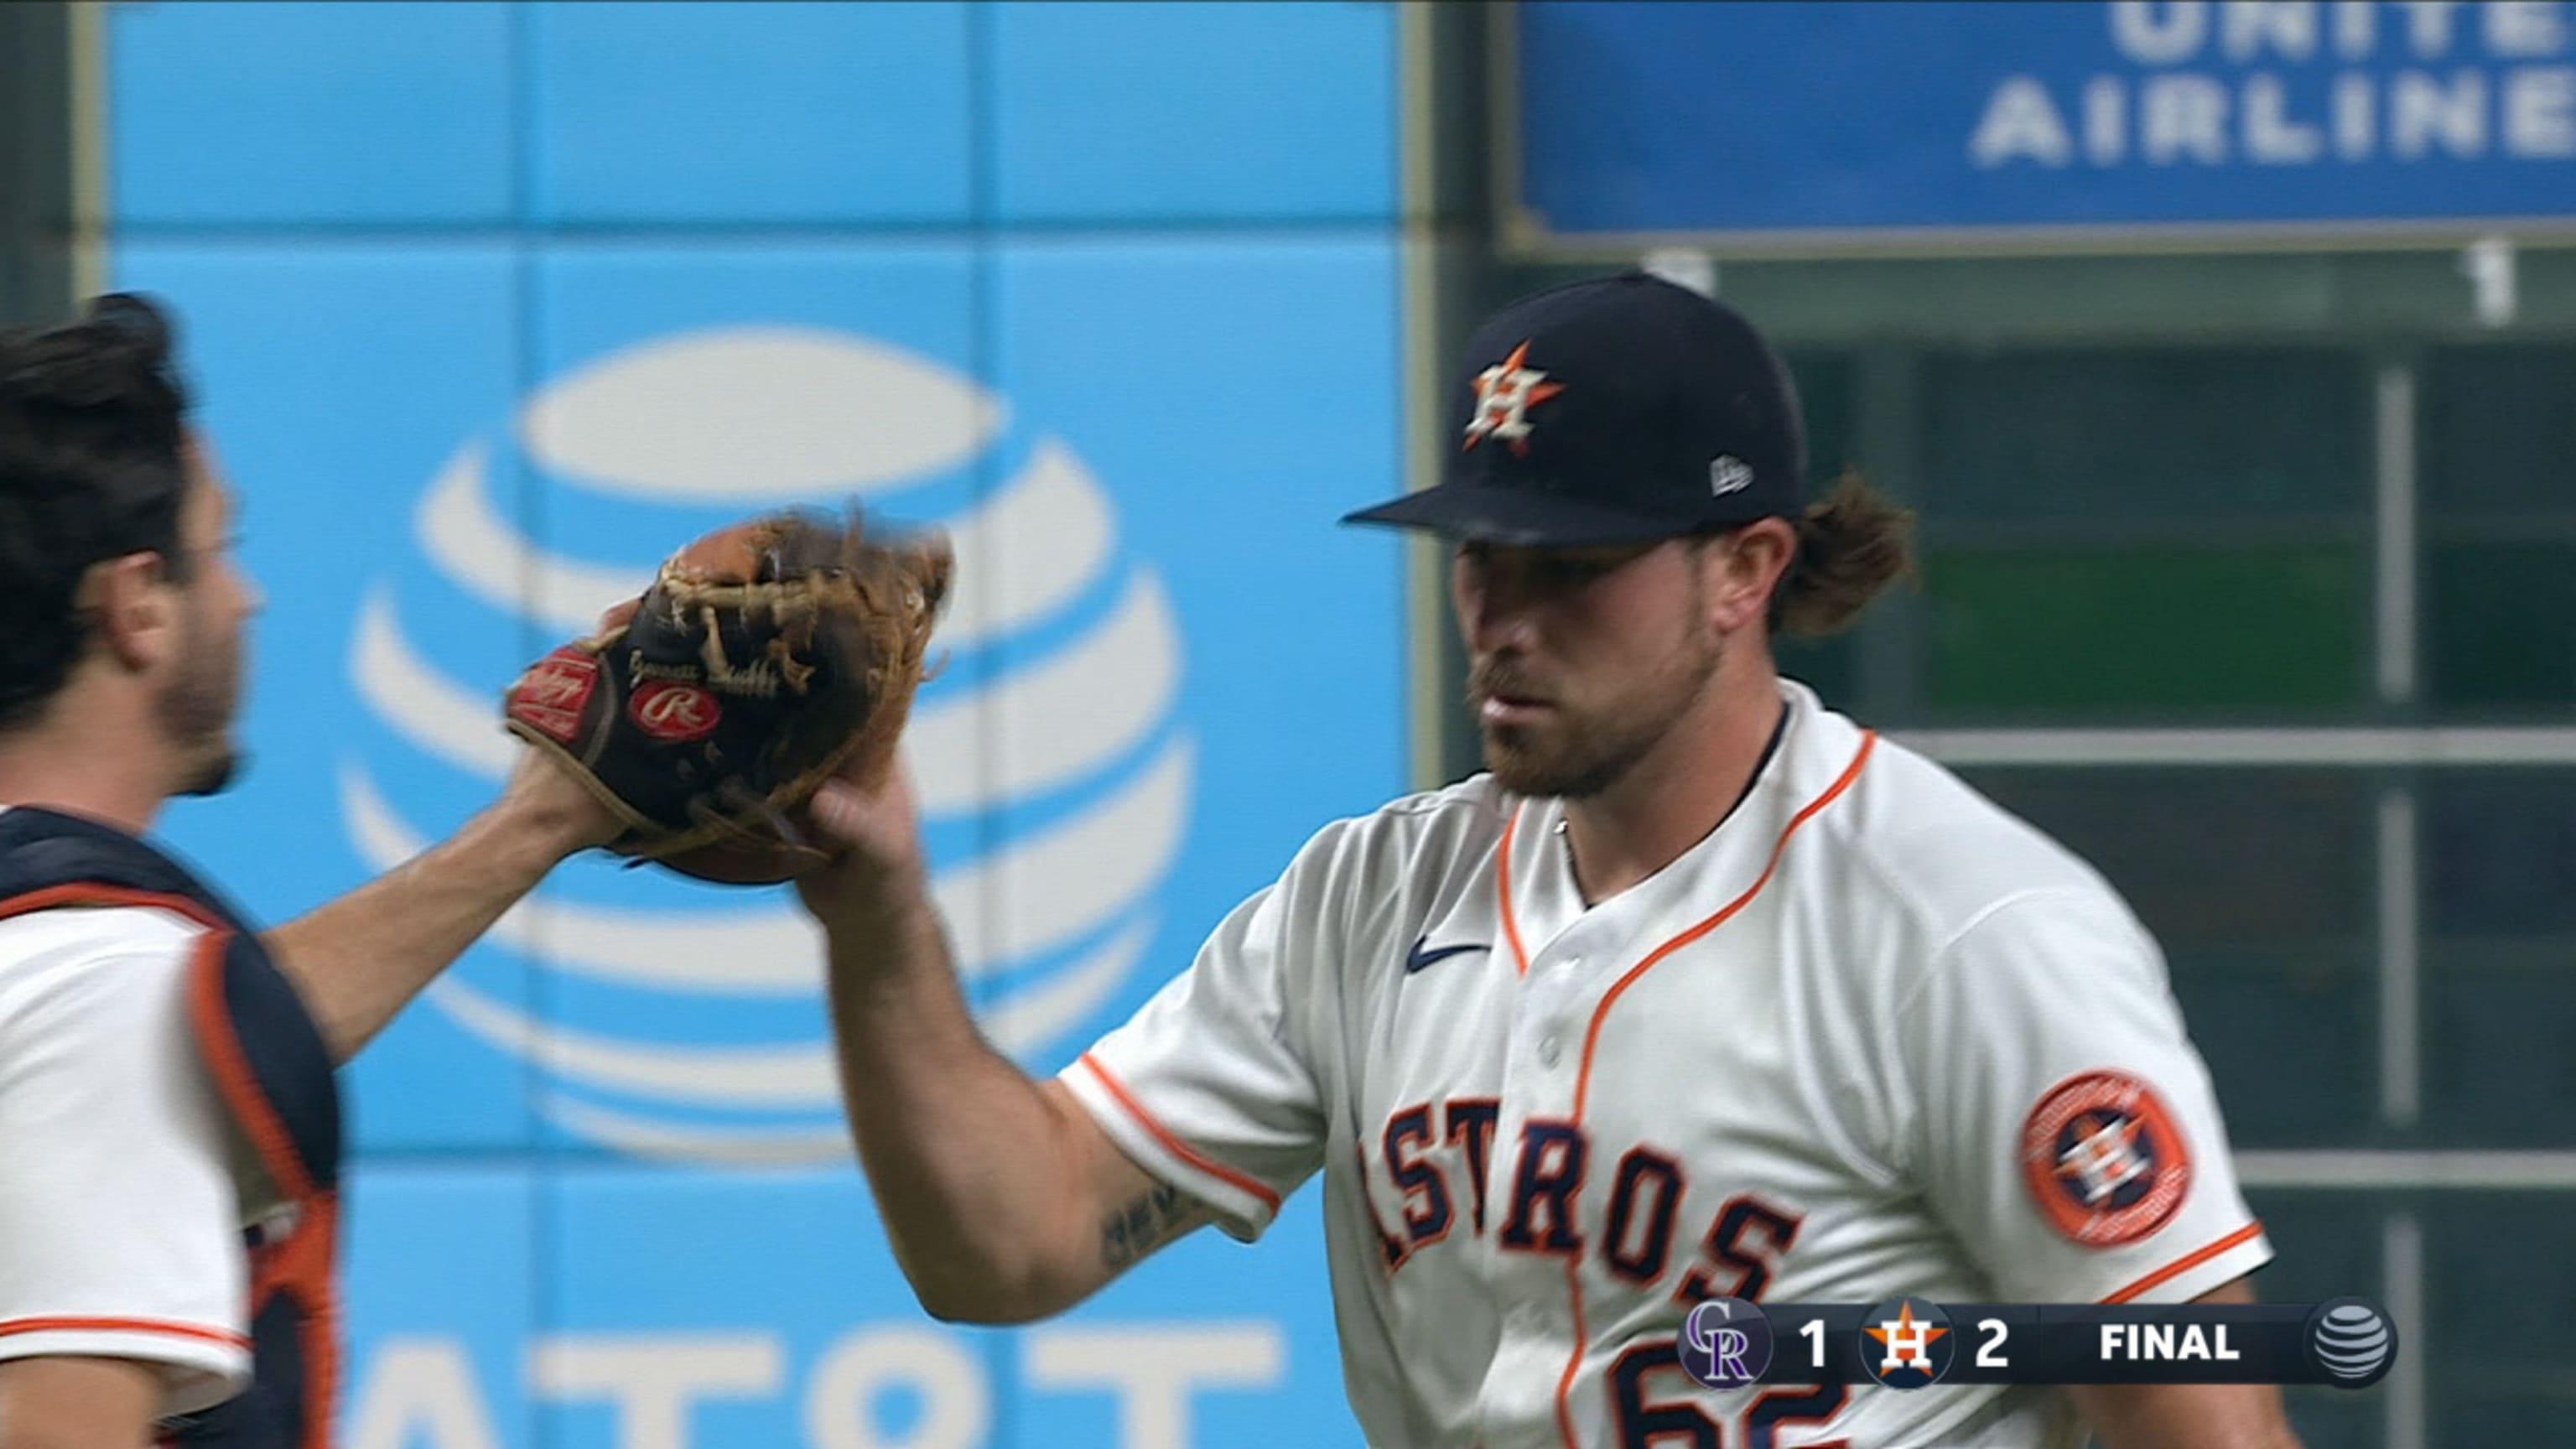 Brad Peacock Houston Astros Spring Training Baseball Player Jersey